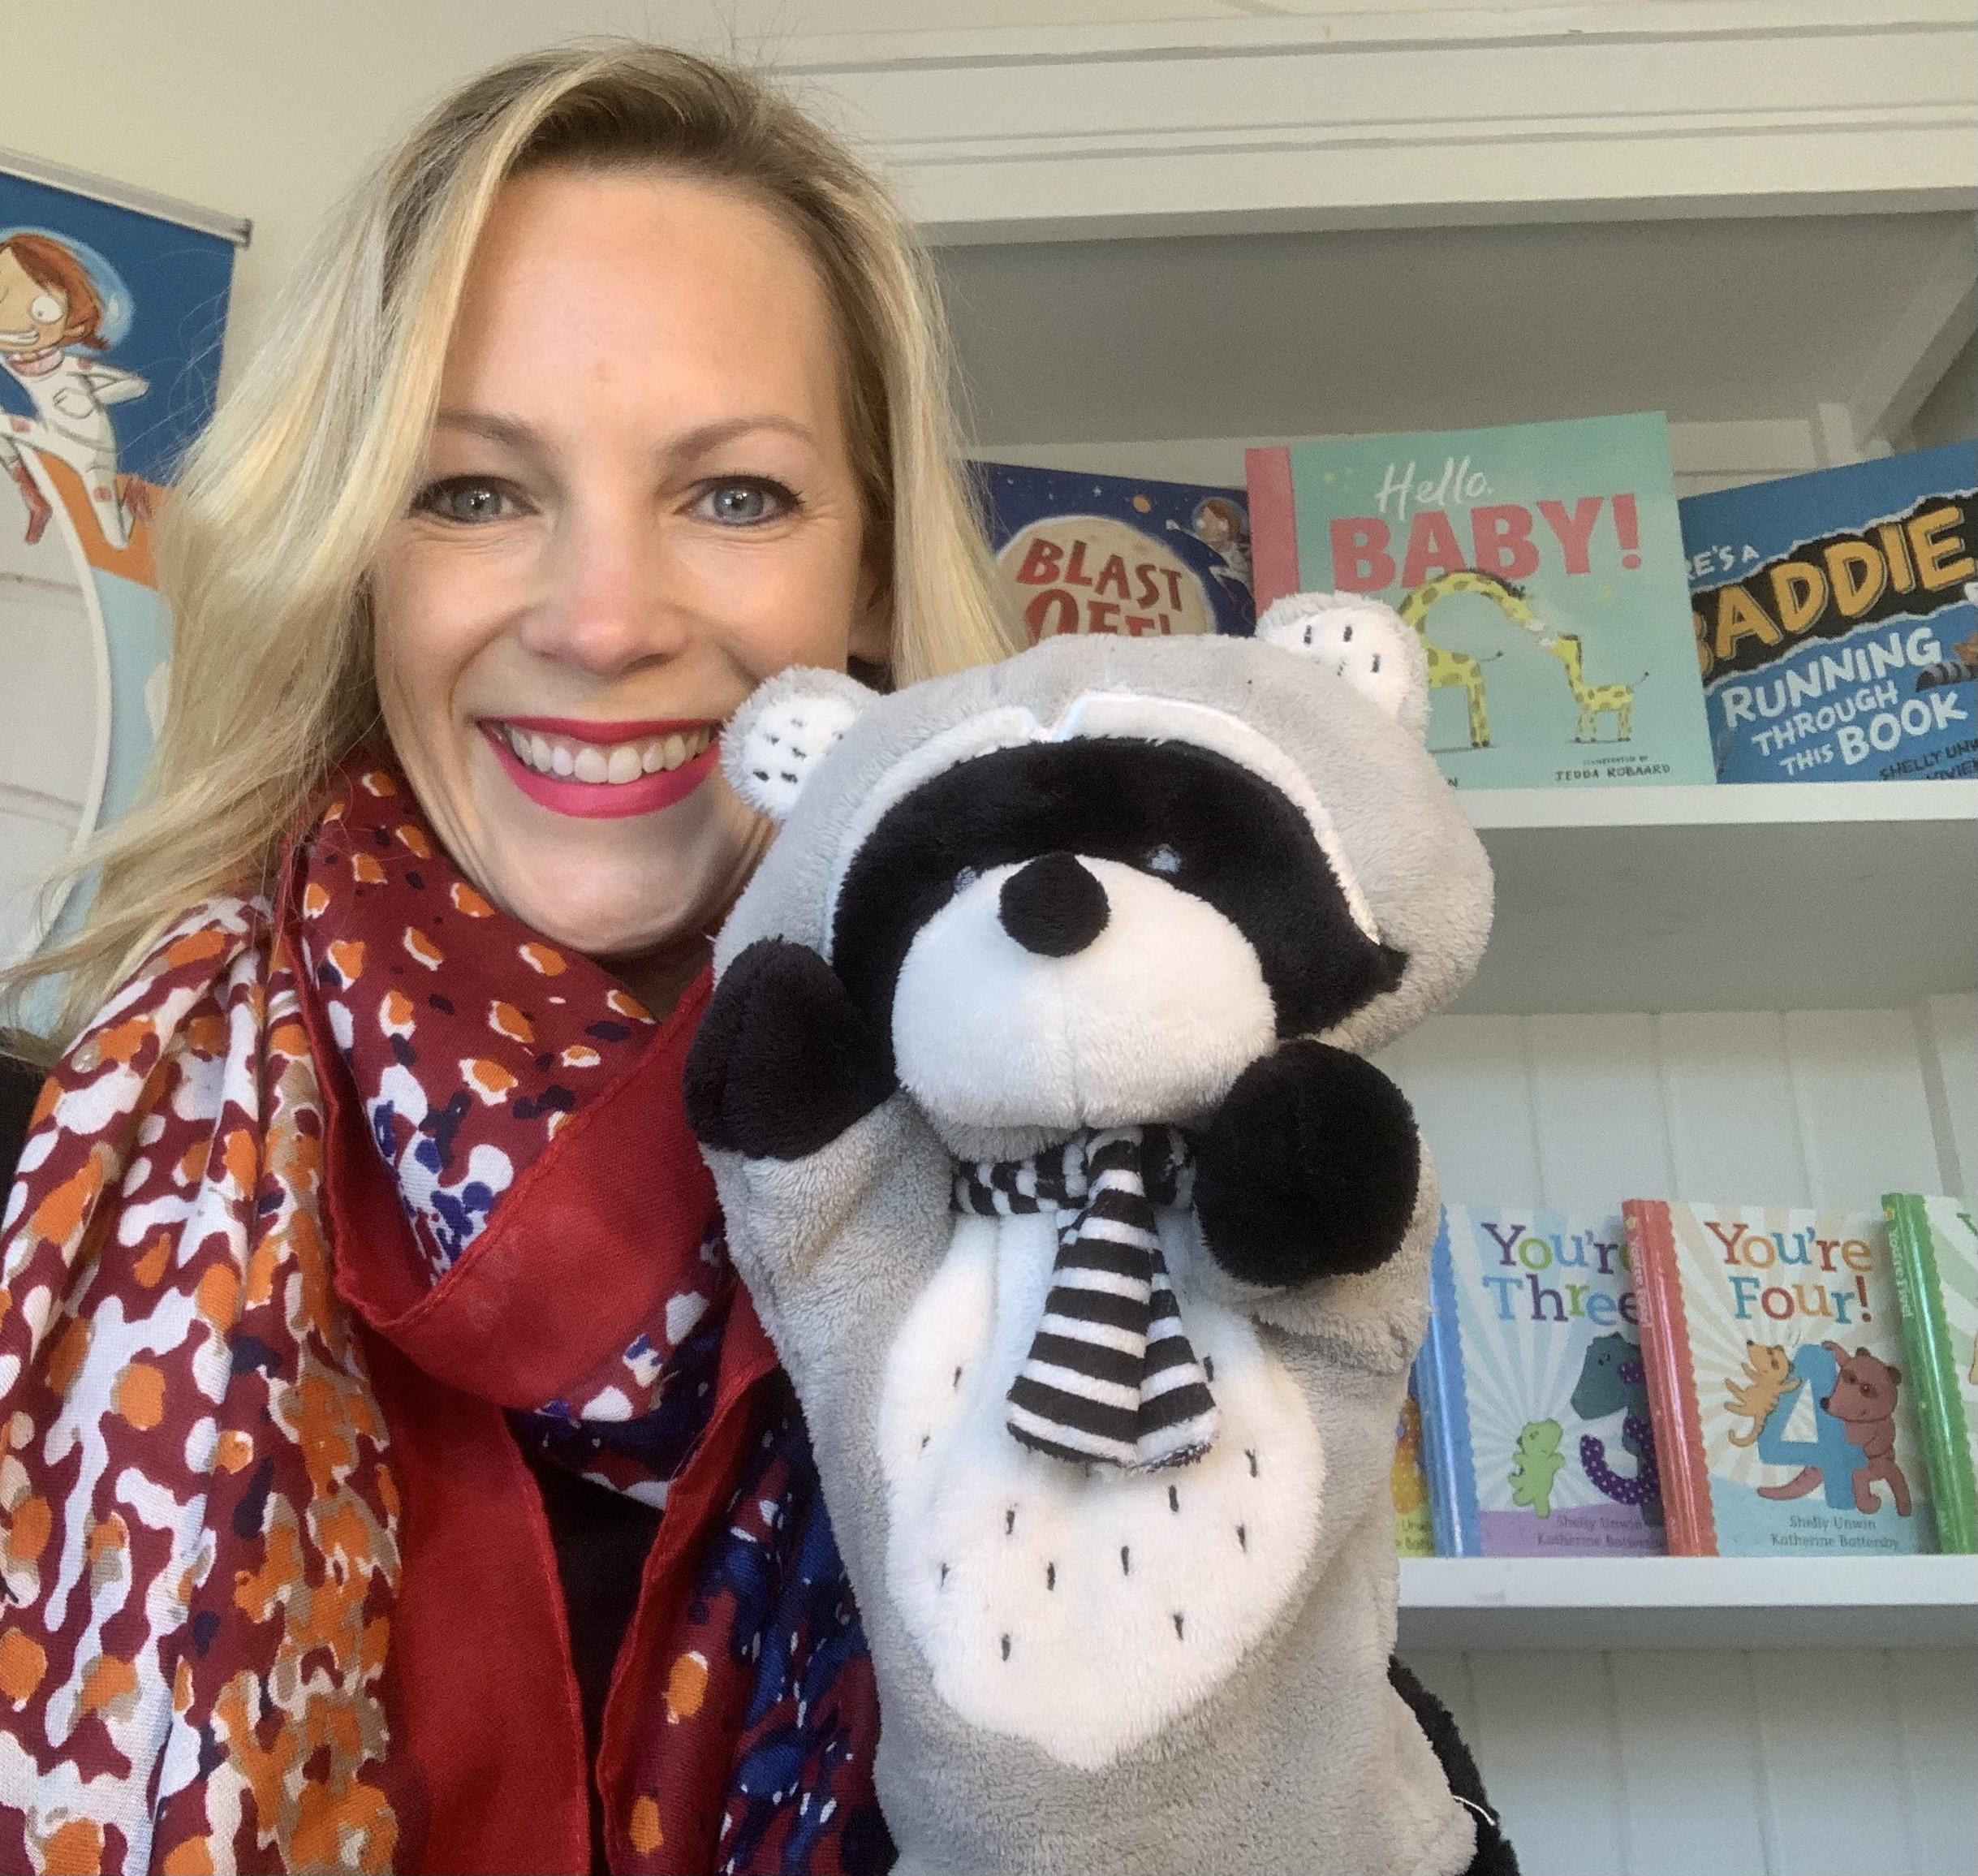 Author Shelly Unwin